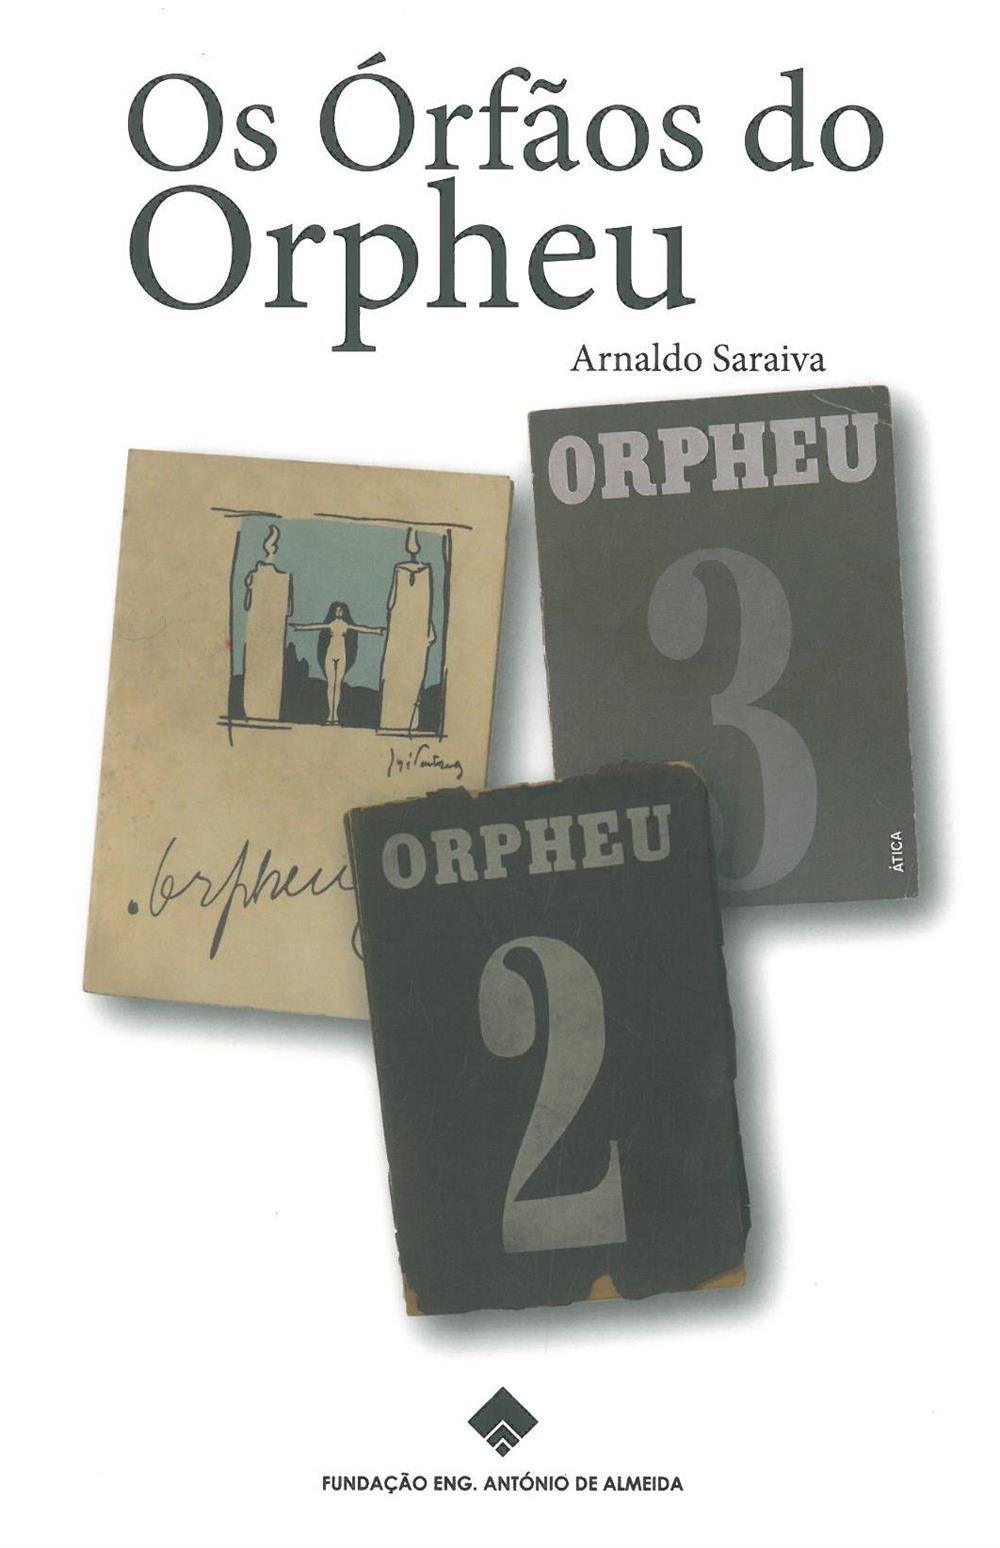 Os órfãos do Orpheu.jpg